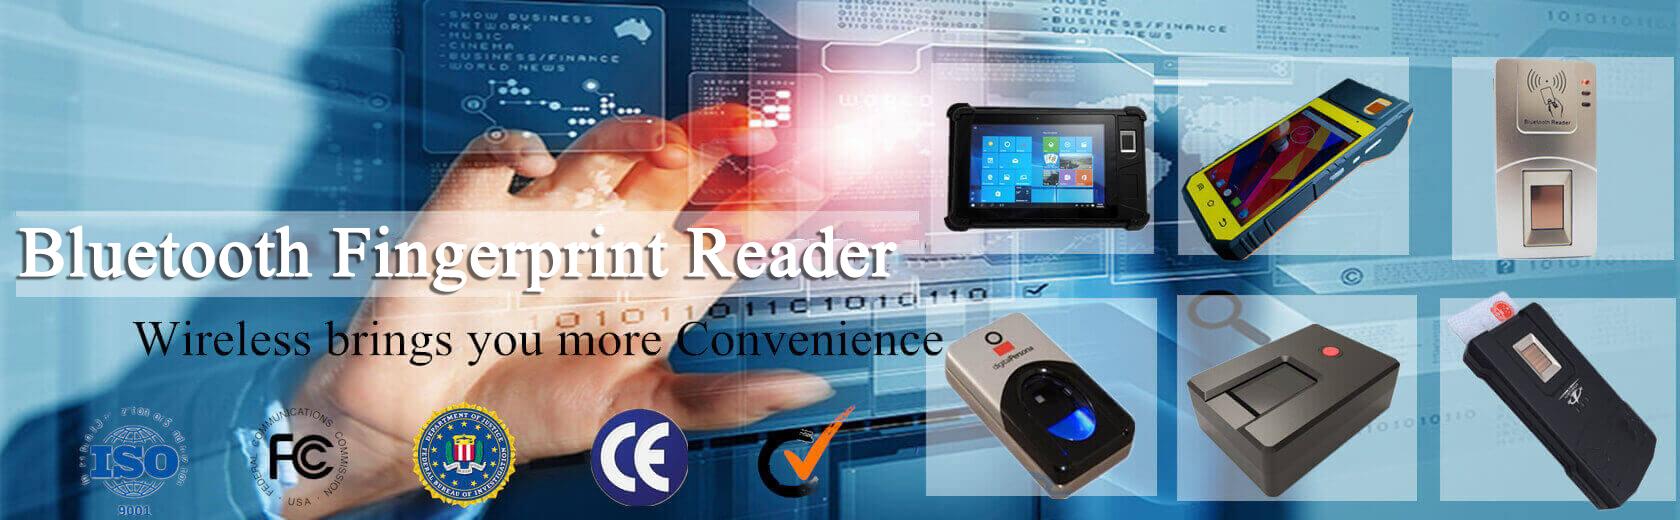 biometric wireless fingerprint reader series